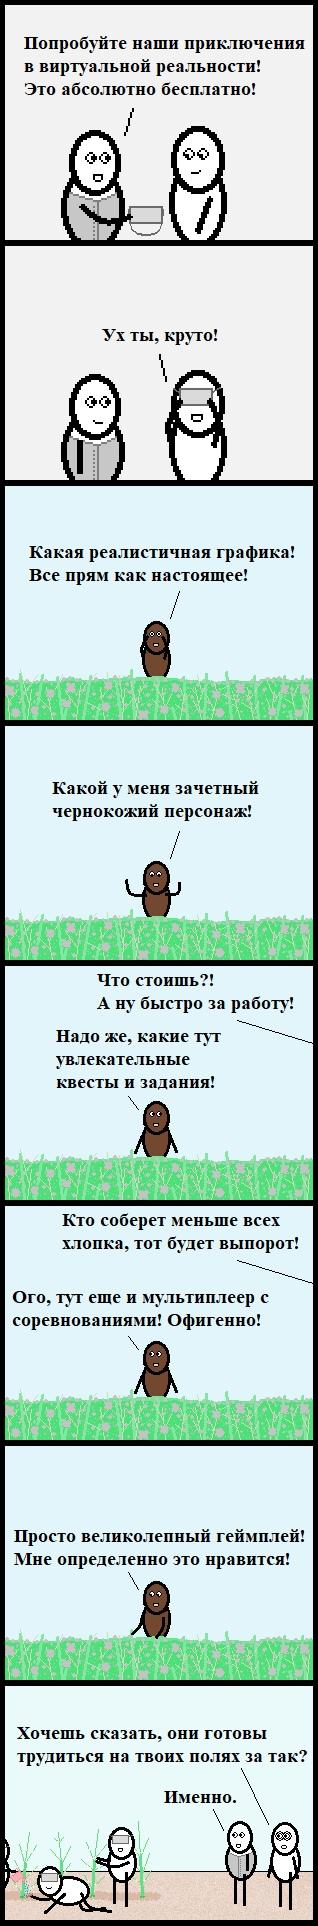 Виртуальное